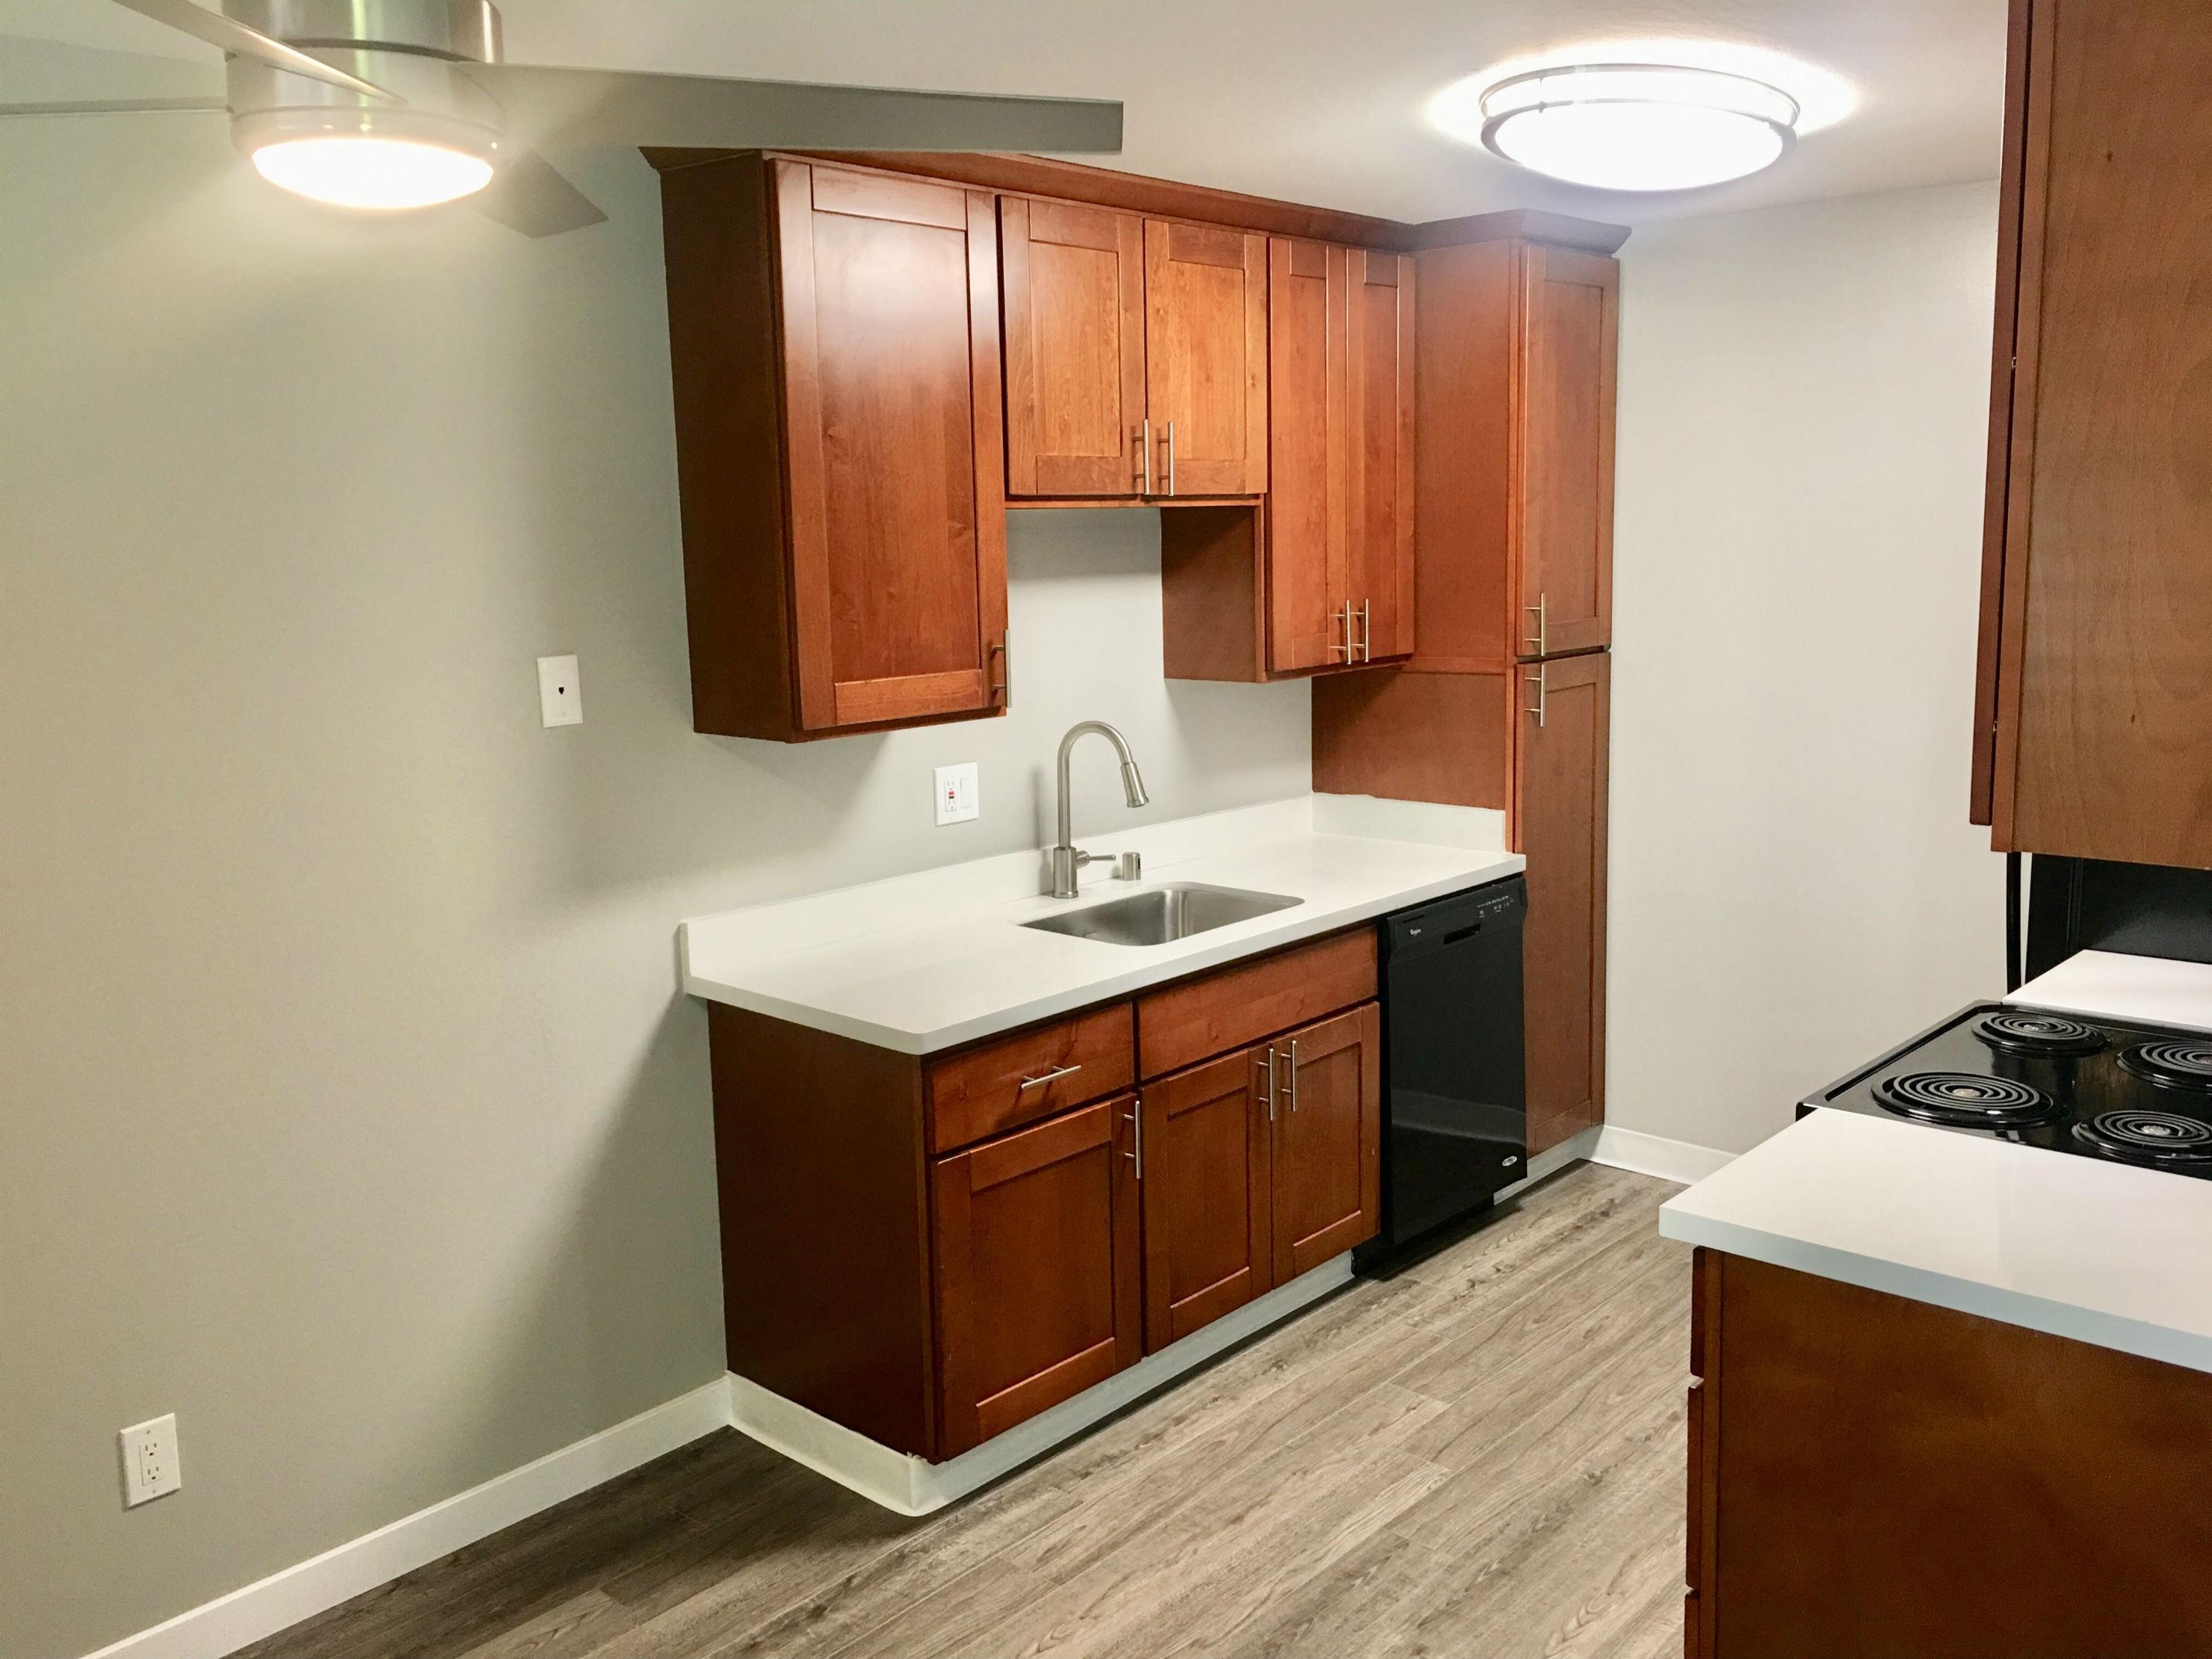 Element Apartment Homes